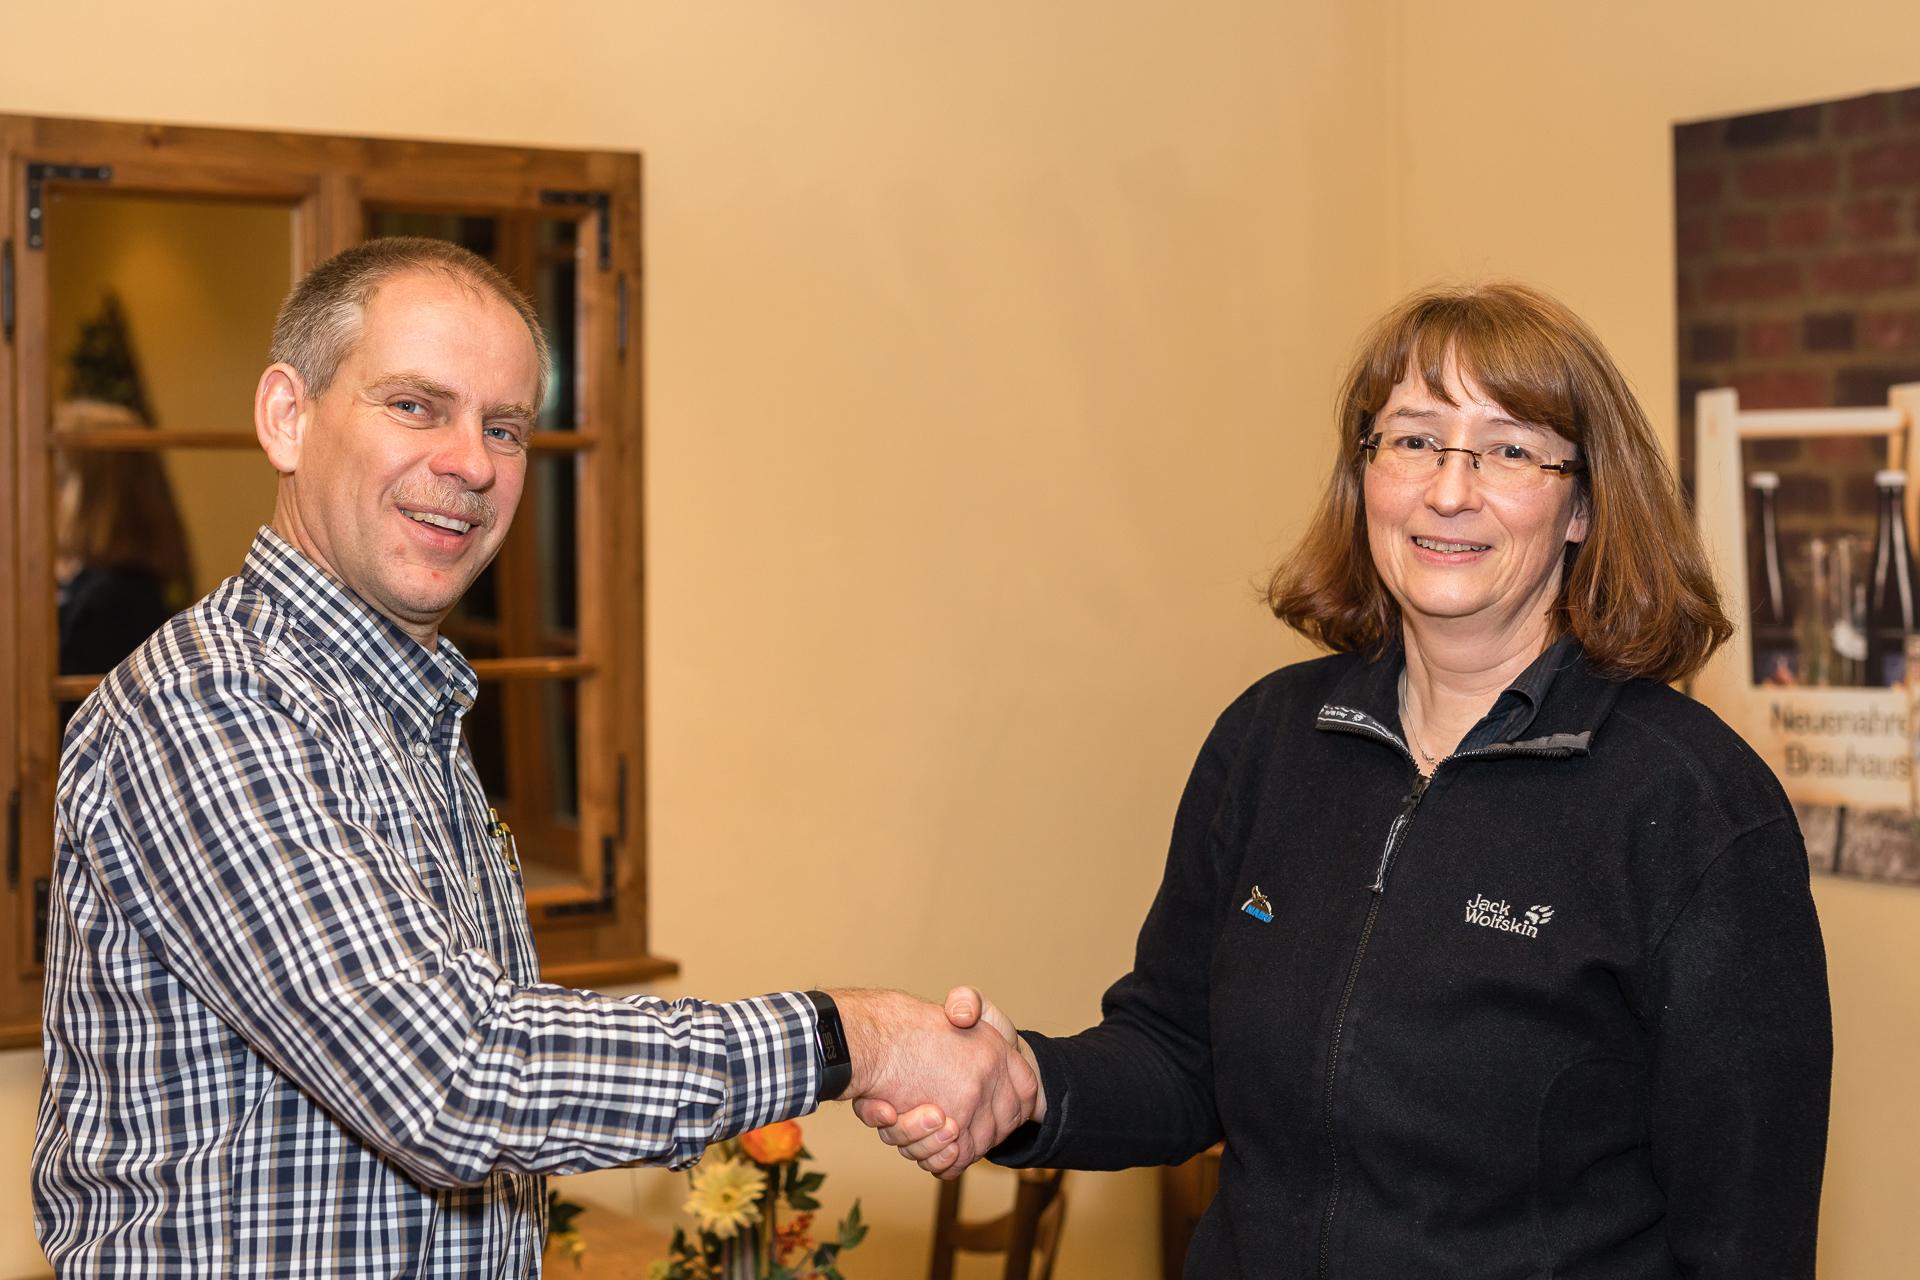 Jens Woitol gratuliert Rea Brinkhoff zur Wahl (Foto: Andreas Sebald)